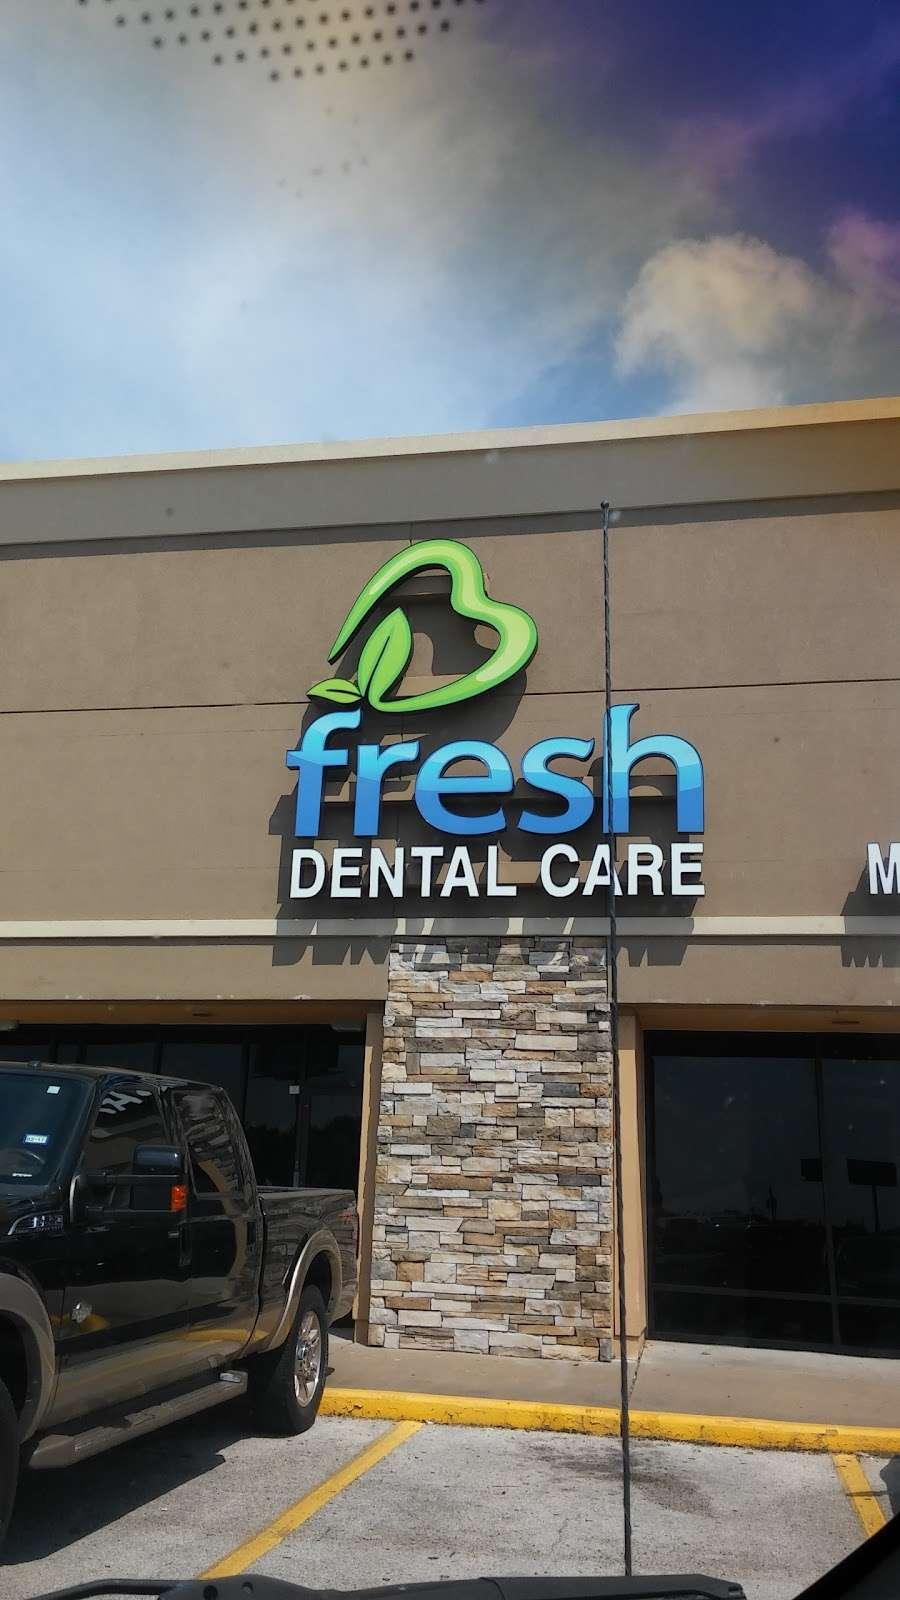 FRESH DENTAL CARE - 45 North - dentist  | Photo 3 of 9 | Address: 5900 North Fwy Suite #105, Houston, TX 77076, USA | Phone: (281) 771-1111